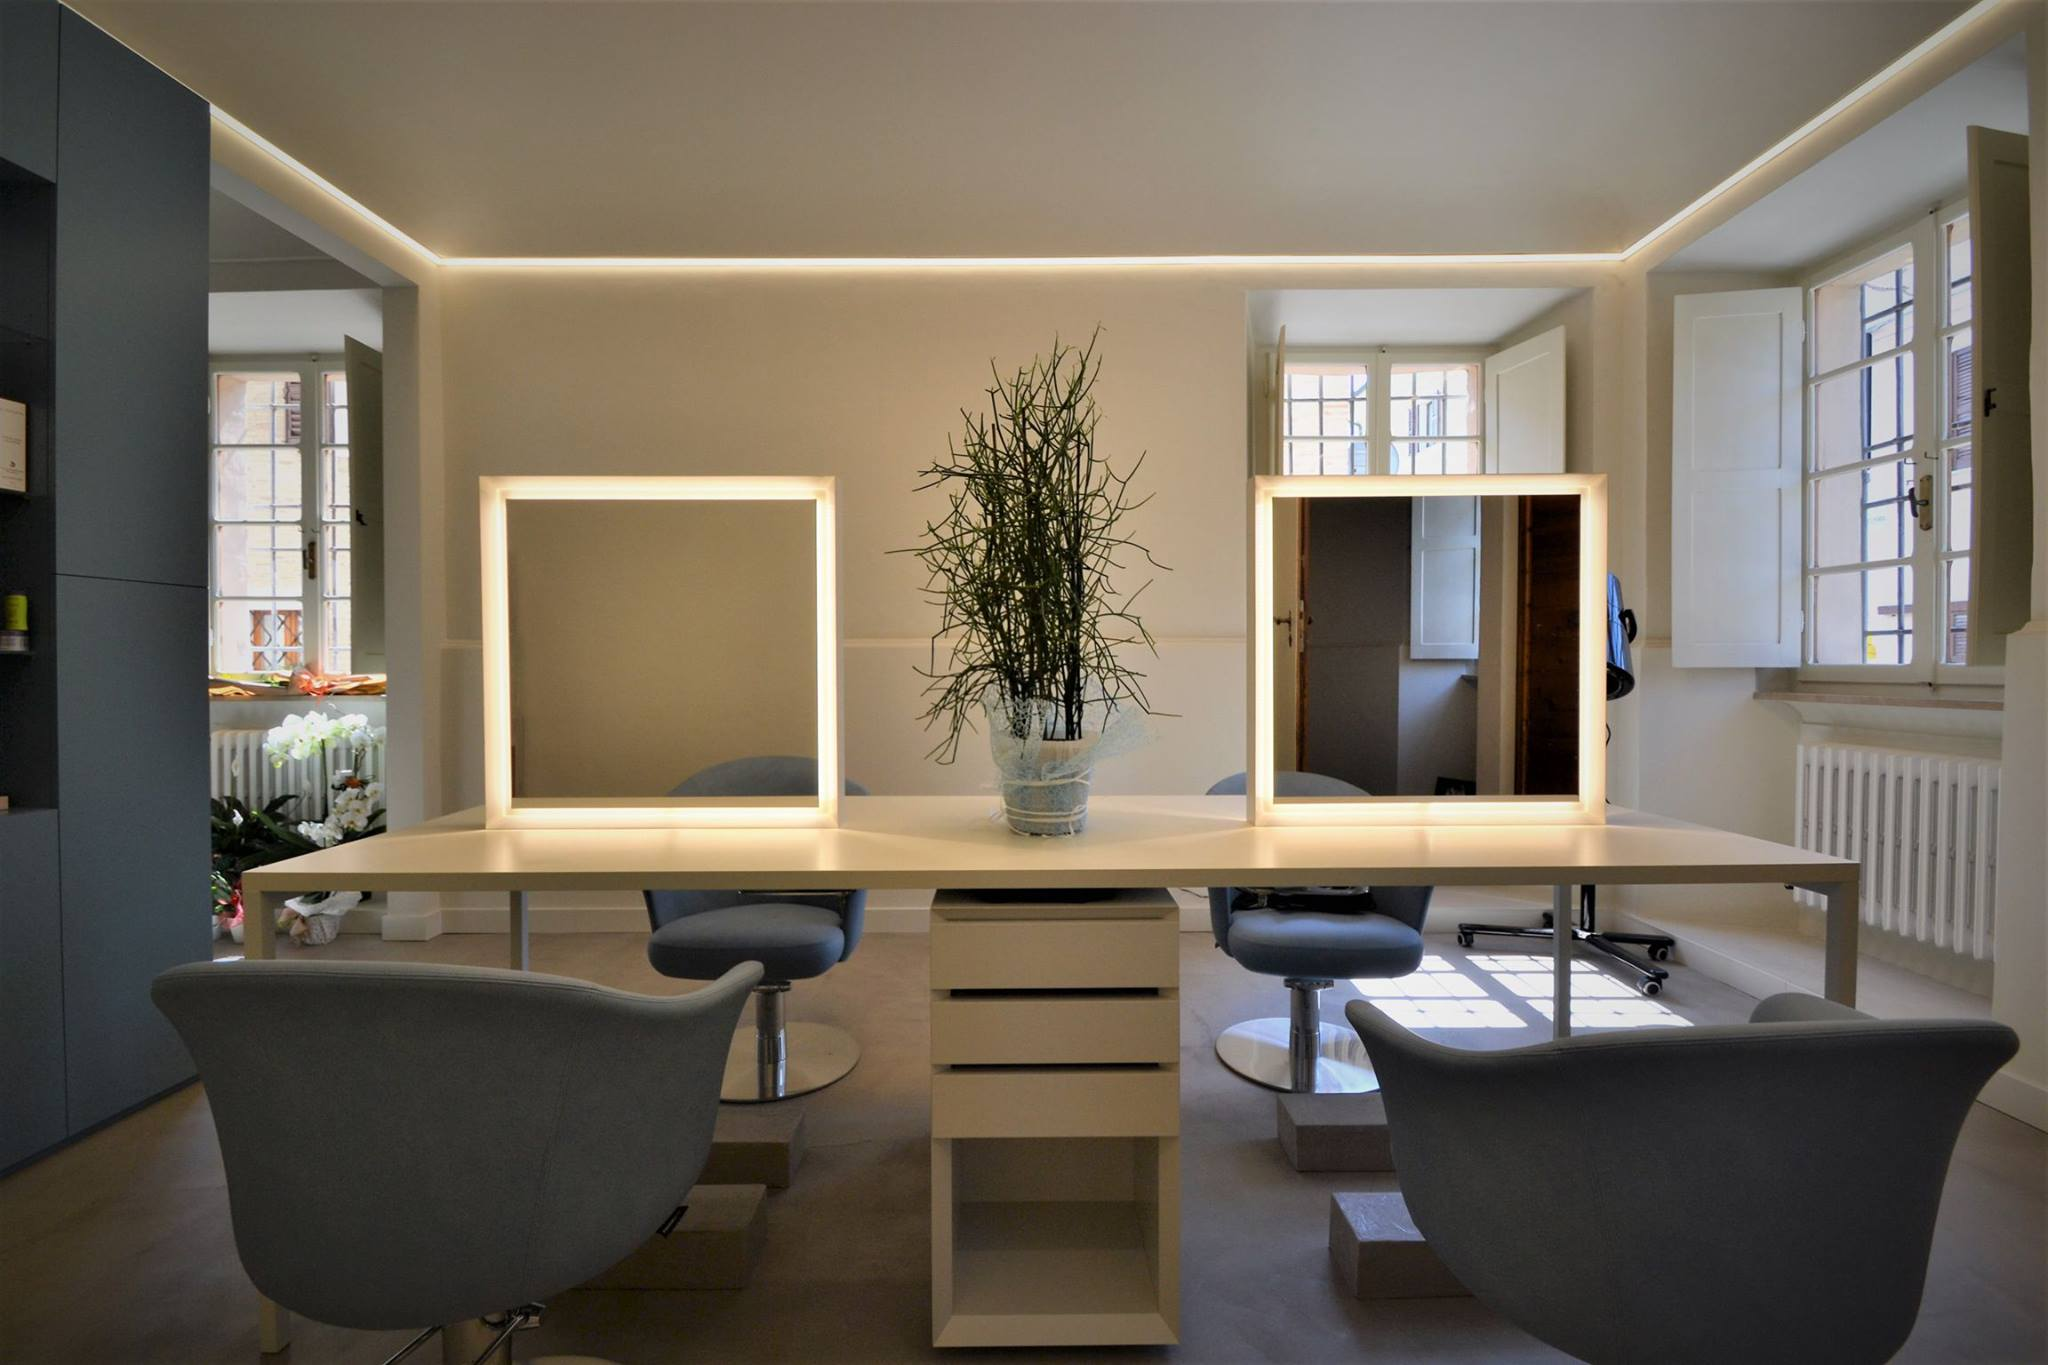 Arredamento casa completo economico simple awesome for Arredo casa on line